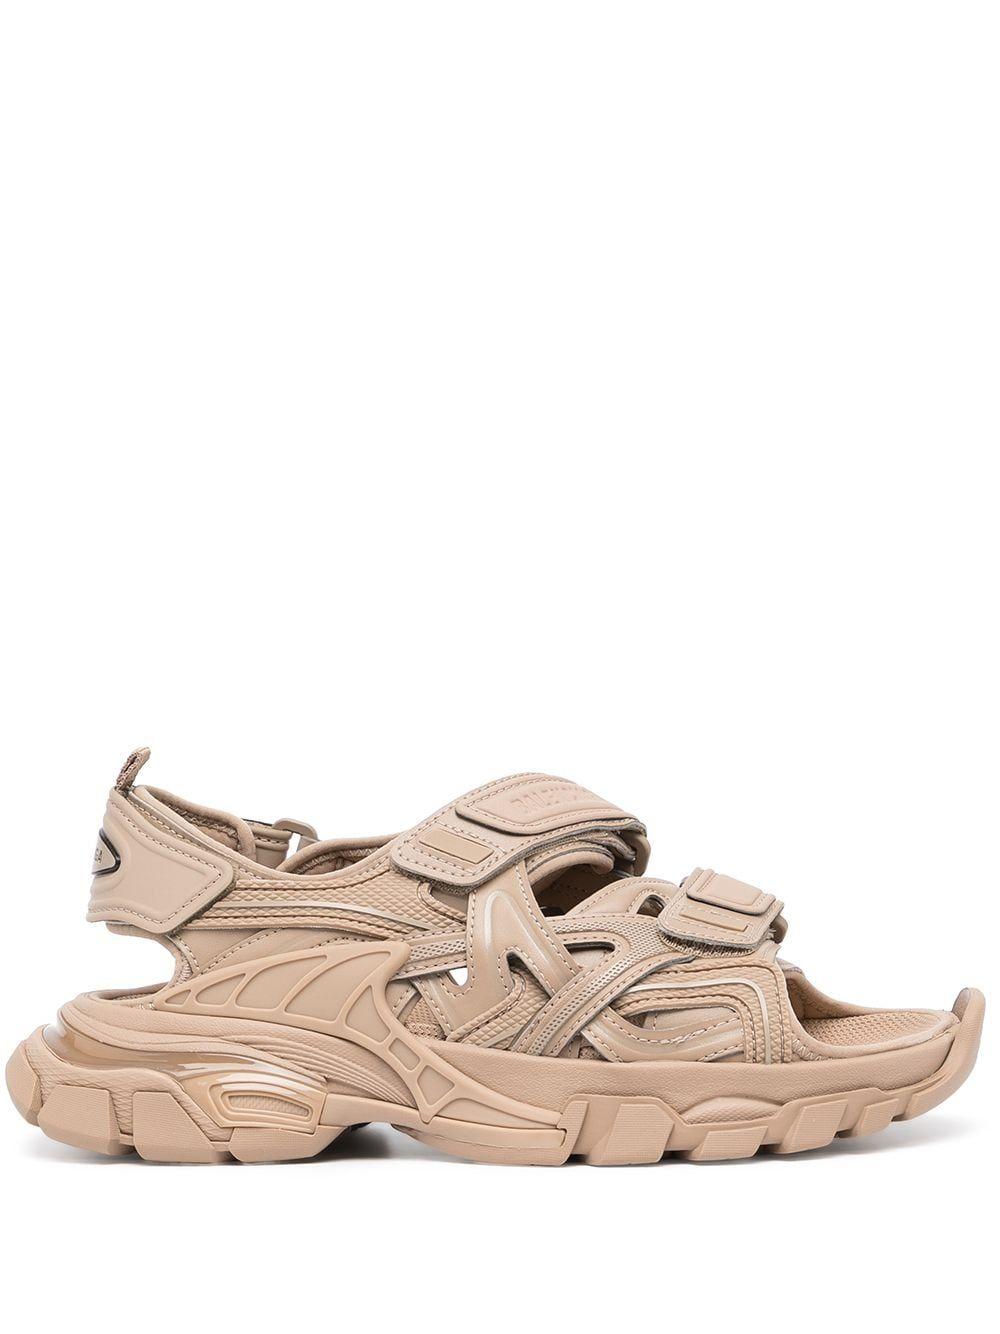 Sandalo track in pelle